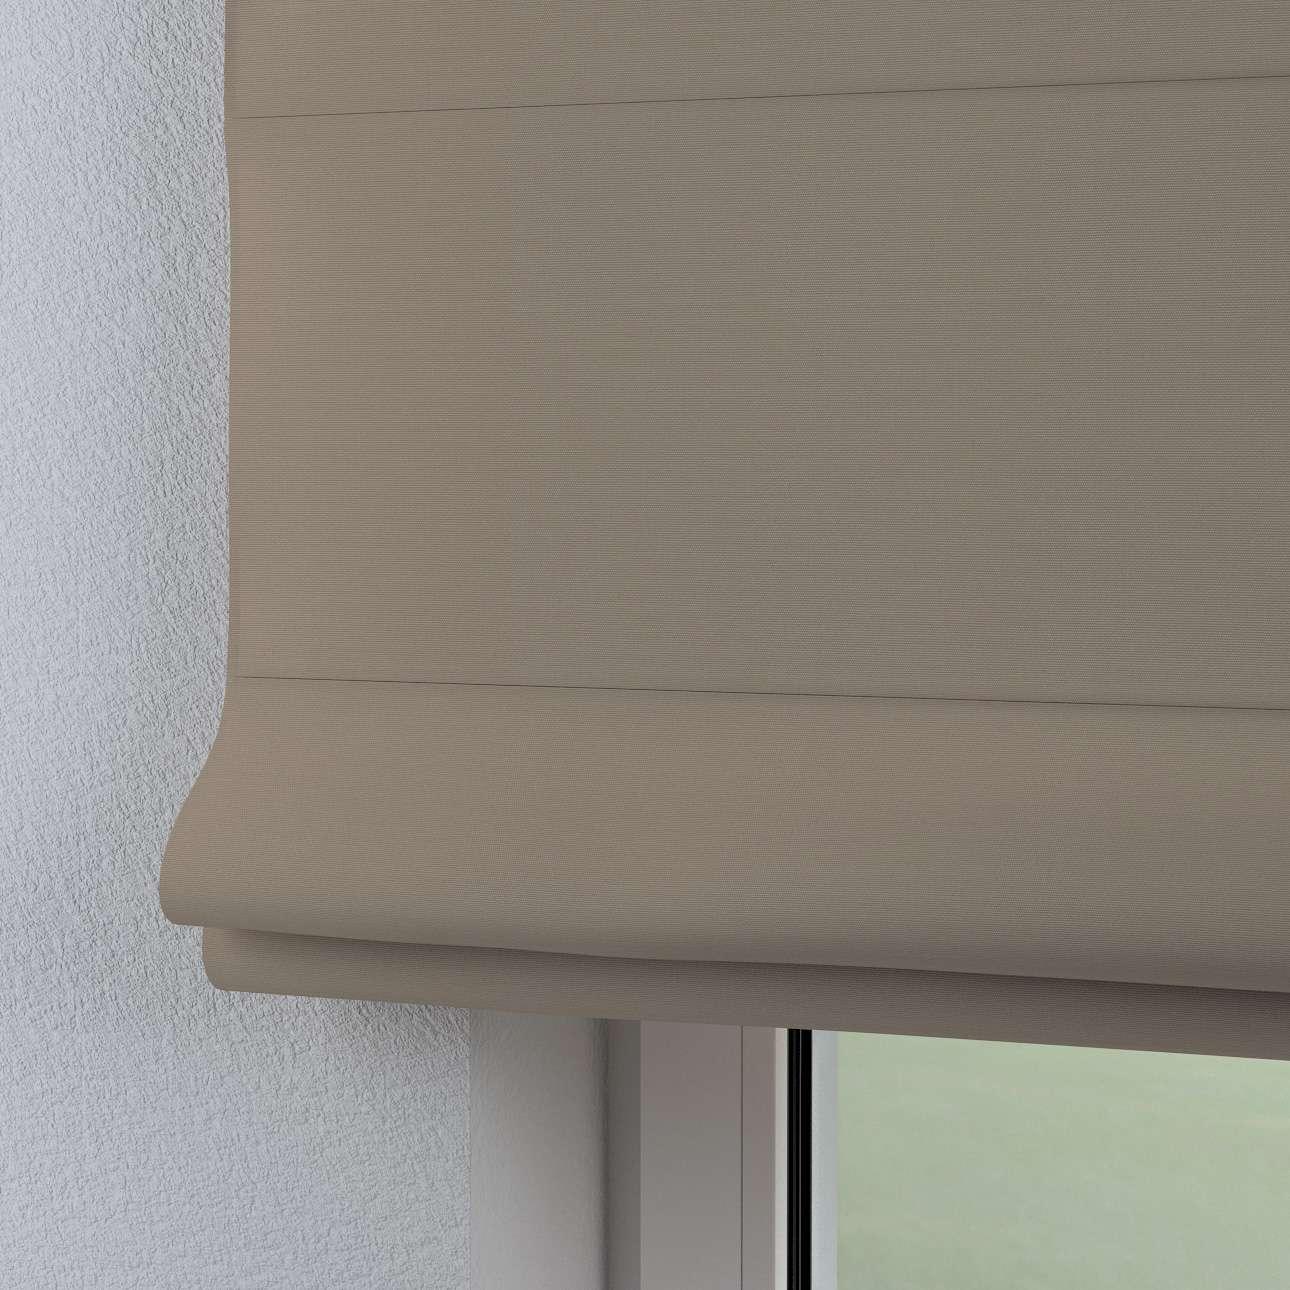 Foldegardin Capri<br/>Uden flæsekant 80 x 170 cm fra kollektionen Cotton Panama, Stof: 702-28